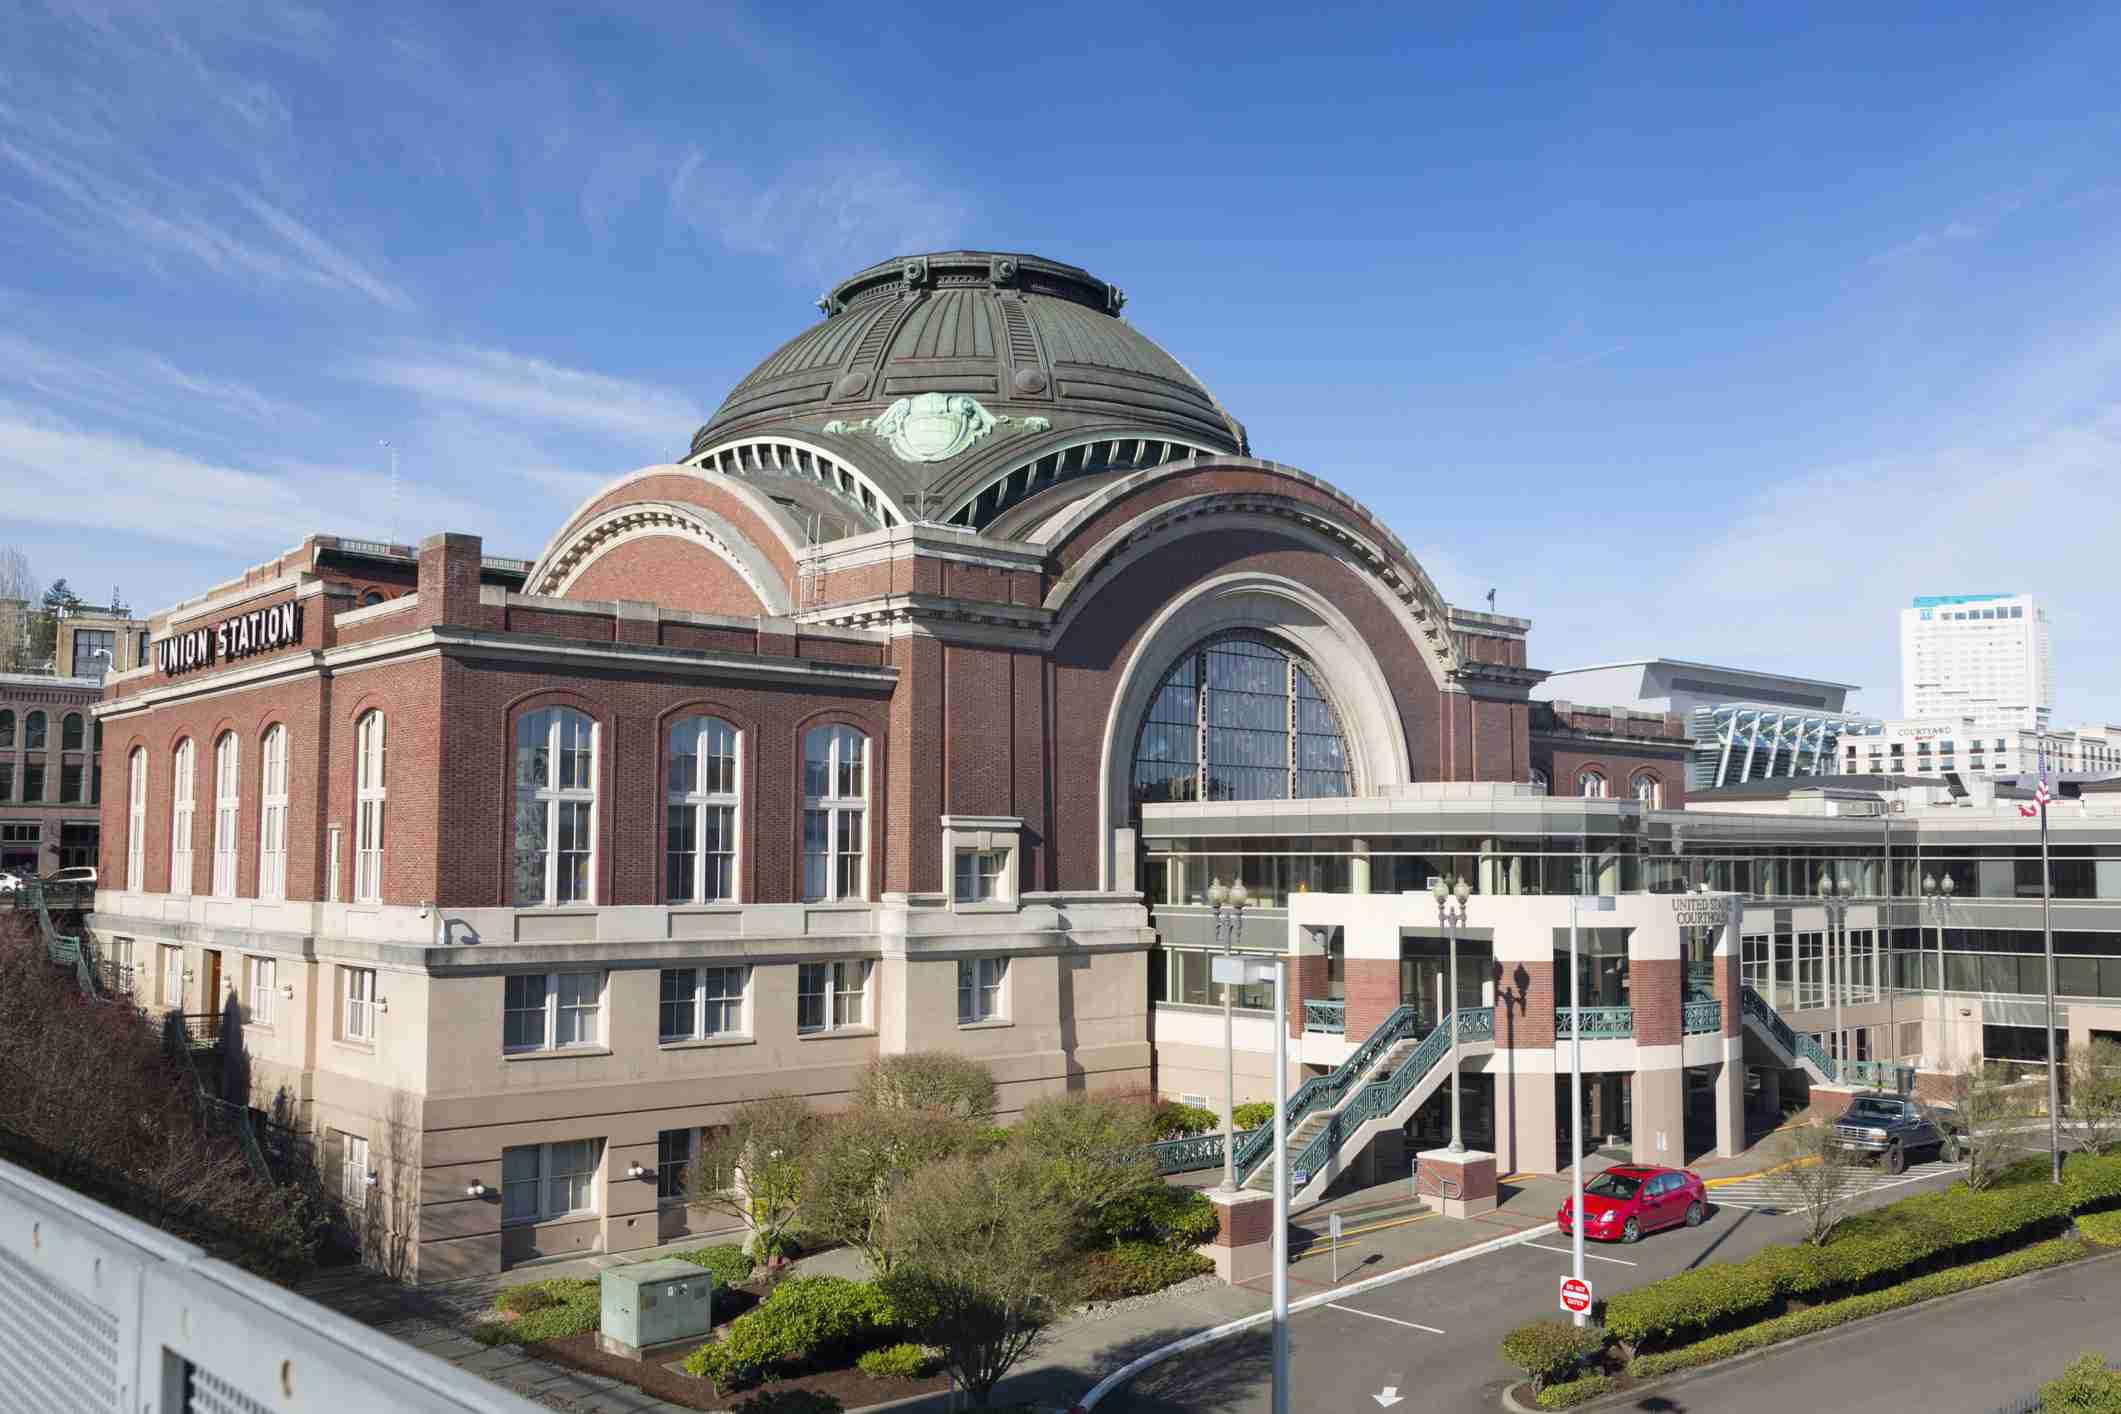 Tacoma's Union Station